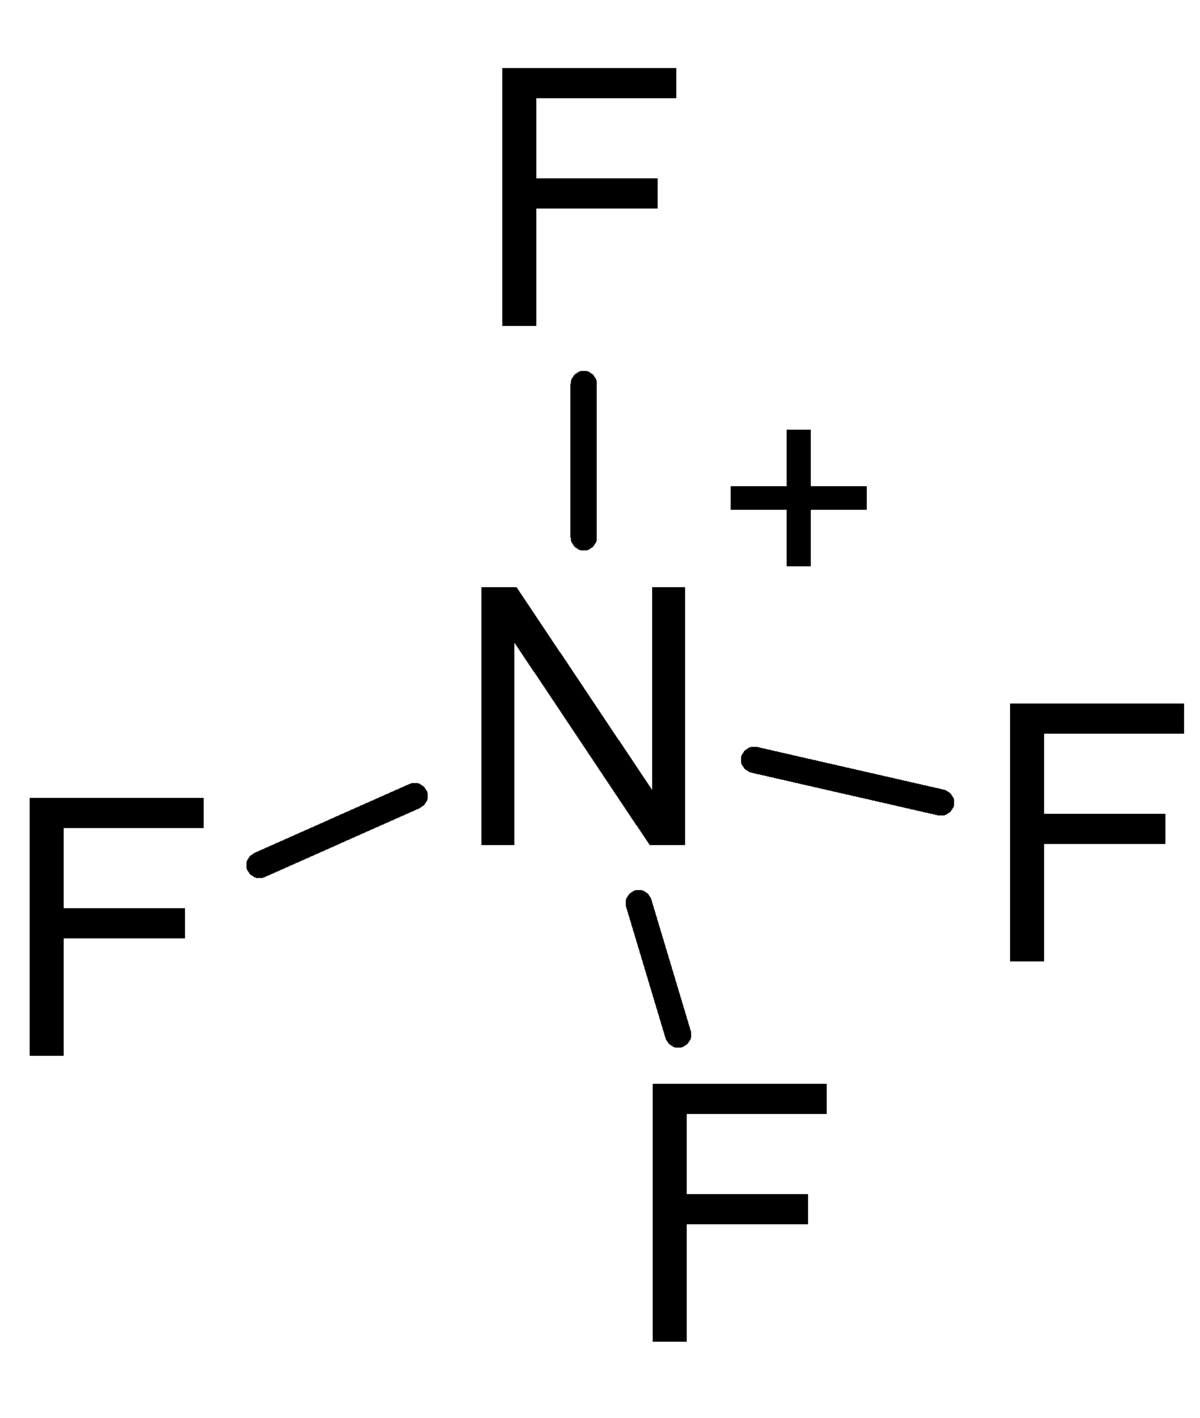 electron dot diagram for fluorine 2001 dodge ram fuse box tetrafluoroammonium wikipedia